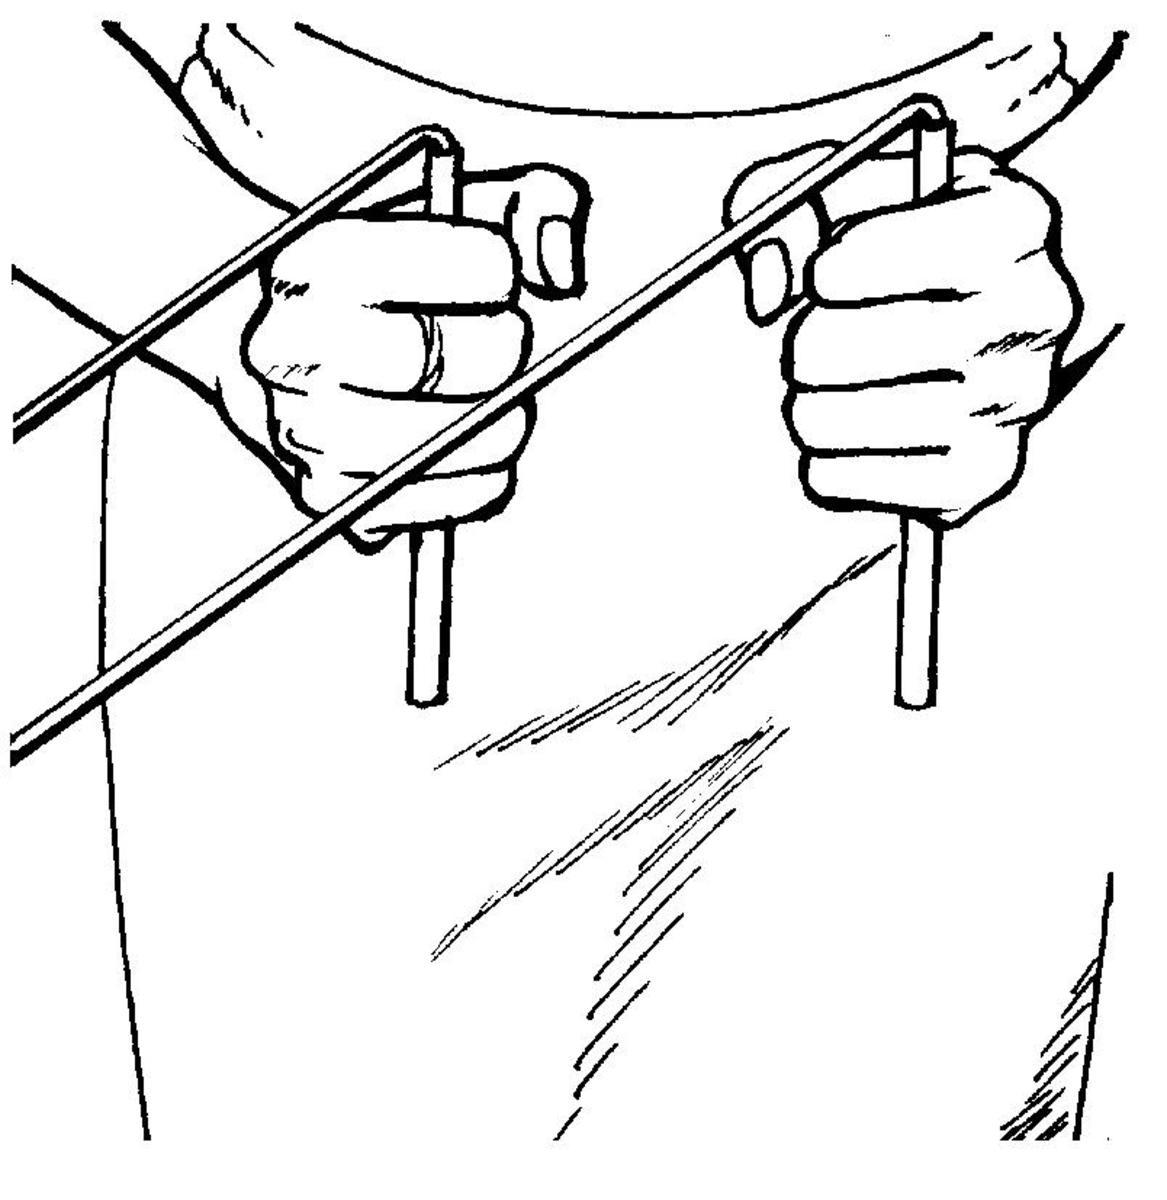 dowsing-for-earthlines